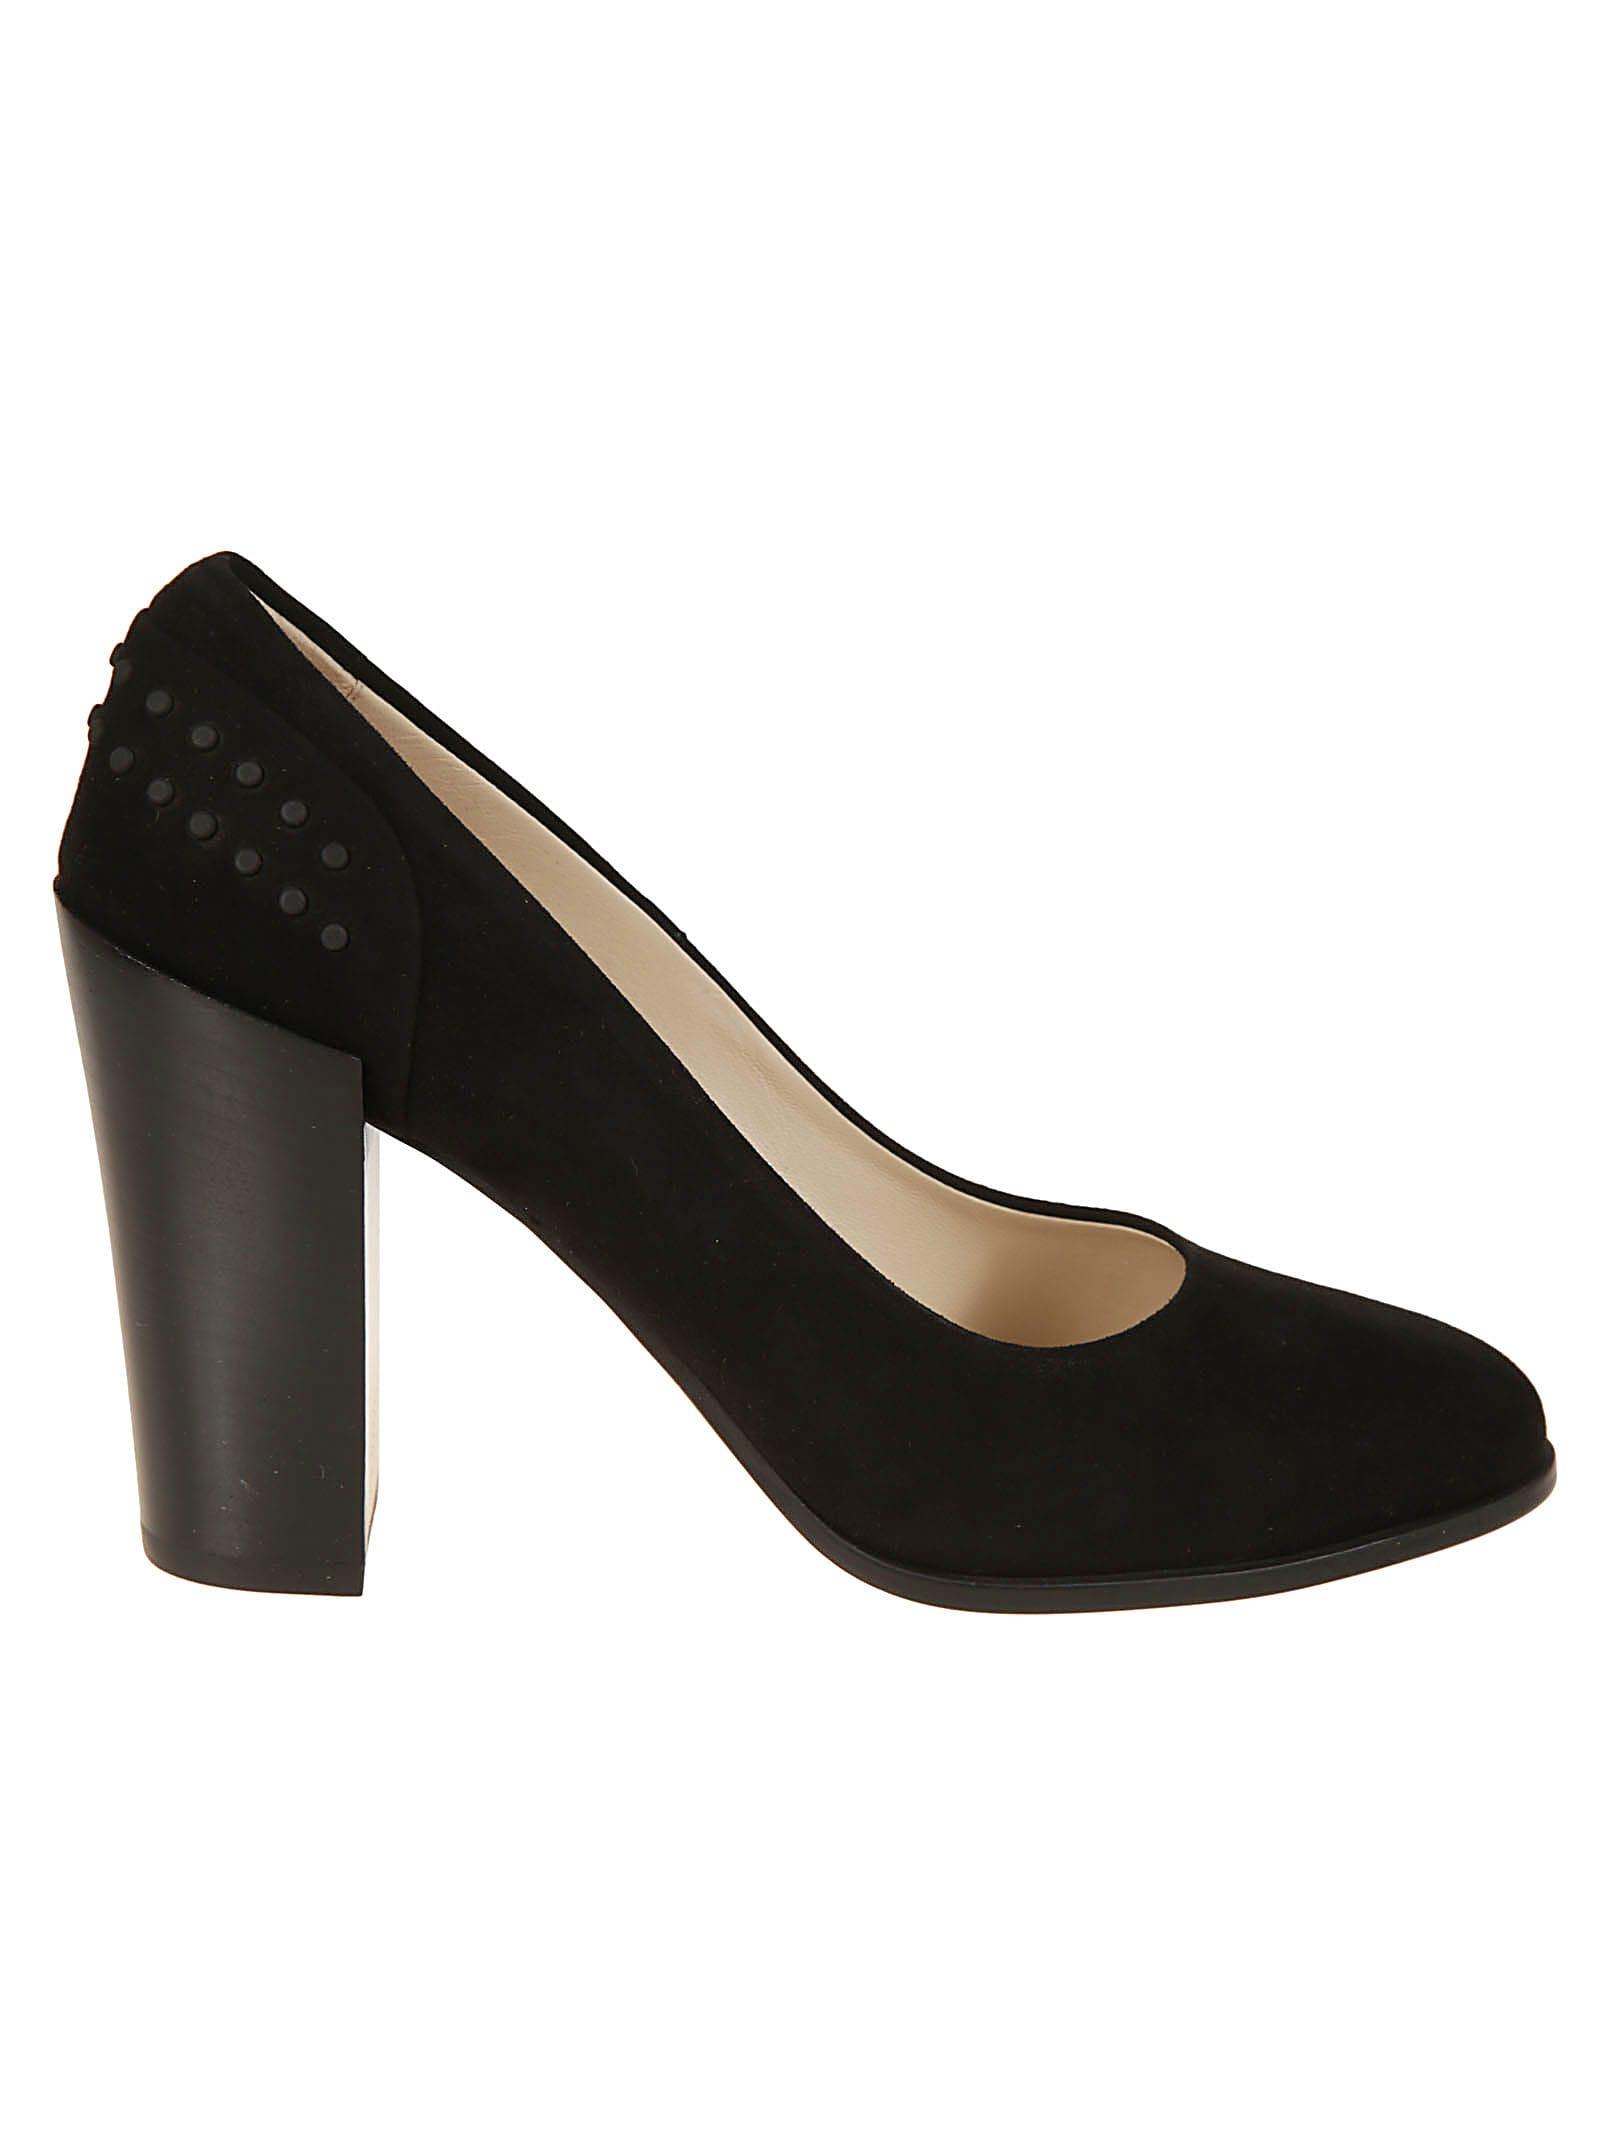 Tods High-heeled shoe